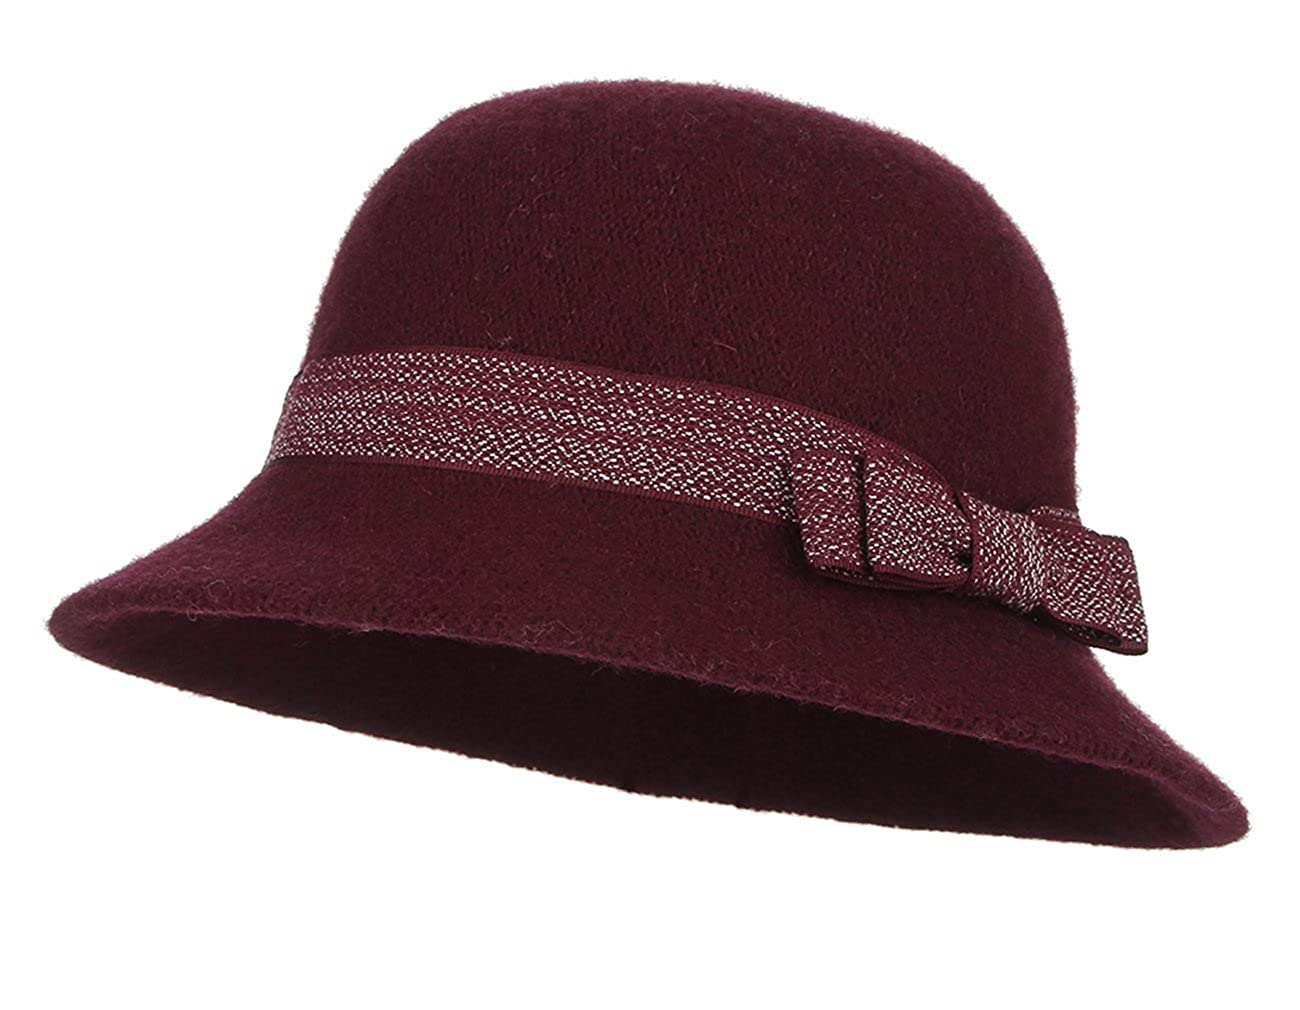 La Vogue Women's Wool Felt Cloche Hats Basin Cap Autumn Winter Ladies Derby Cloche Hat with Bowknot